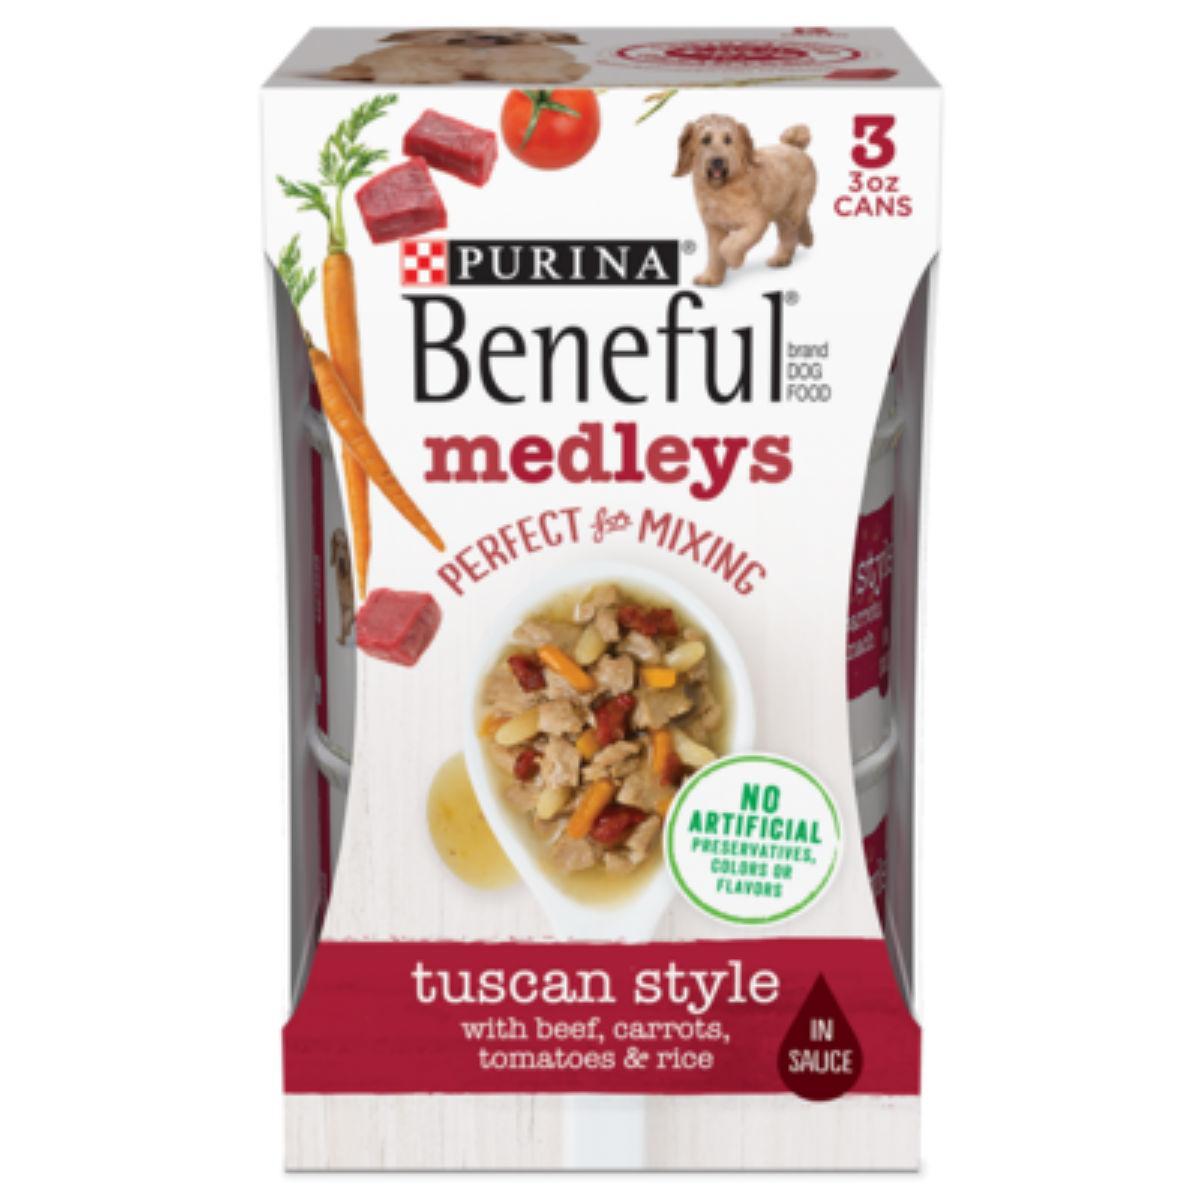 Purina Beneful Medleys Wet Dog Food - Tuscan Style